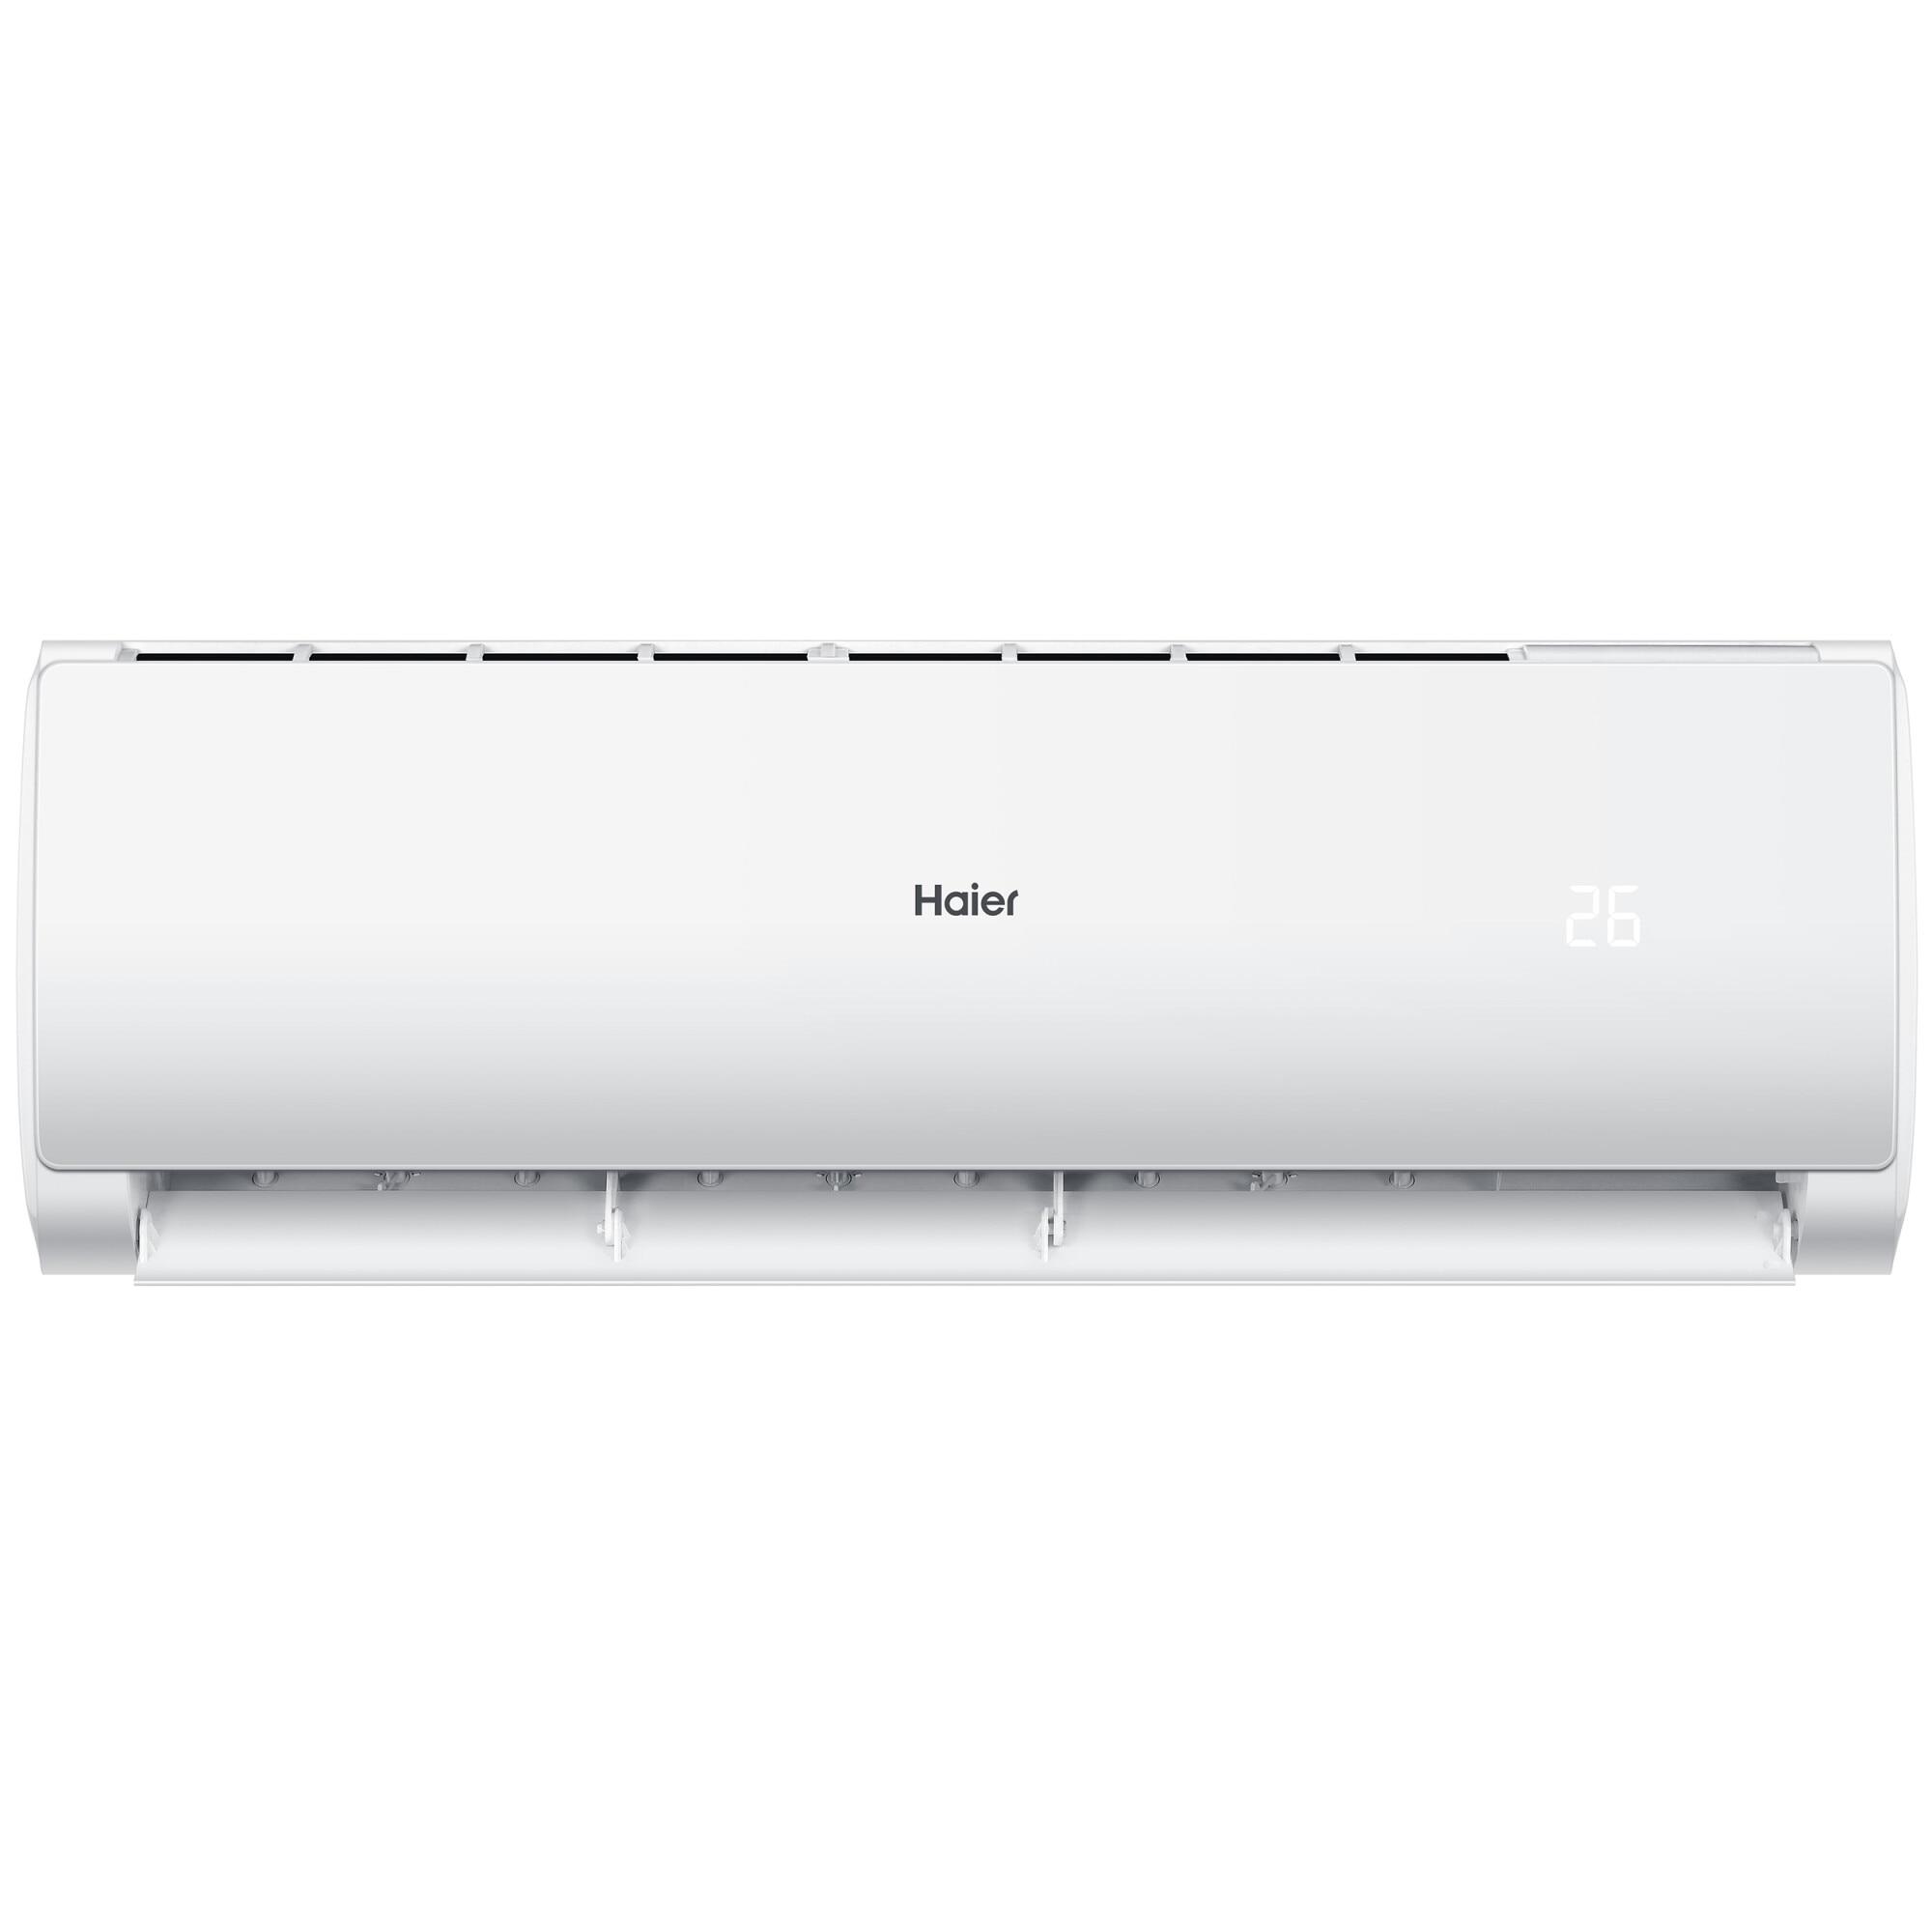 Fotografie Aparat de aer conditionat Haier 18000 BTU Wi-Fi, Self-Clean, Auto Restart, Turbo Cooling, Clasa A++, Alb, AS50TDMHRA-C/1U50MEMFRA-C